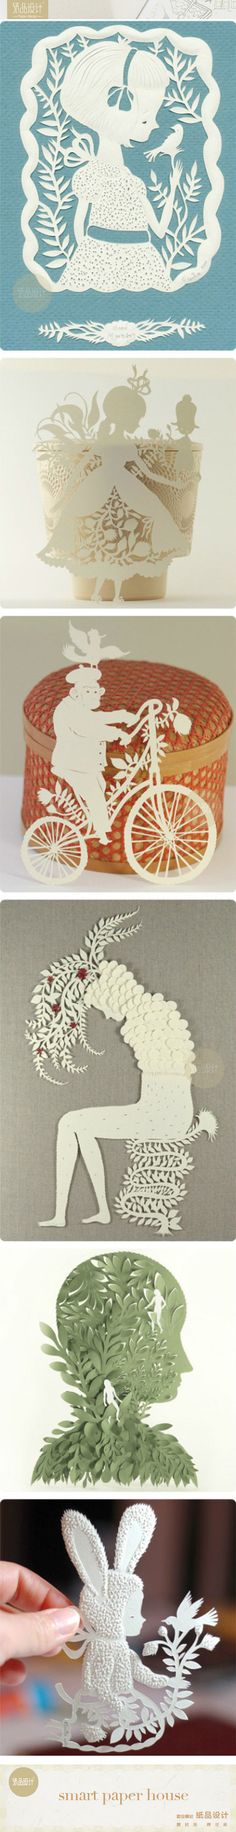 Exquisite papercut artist Elsa Mora